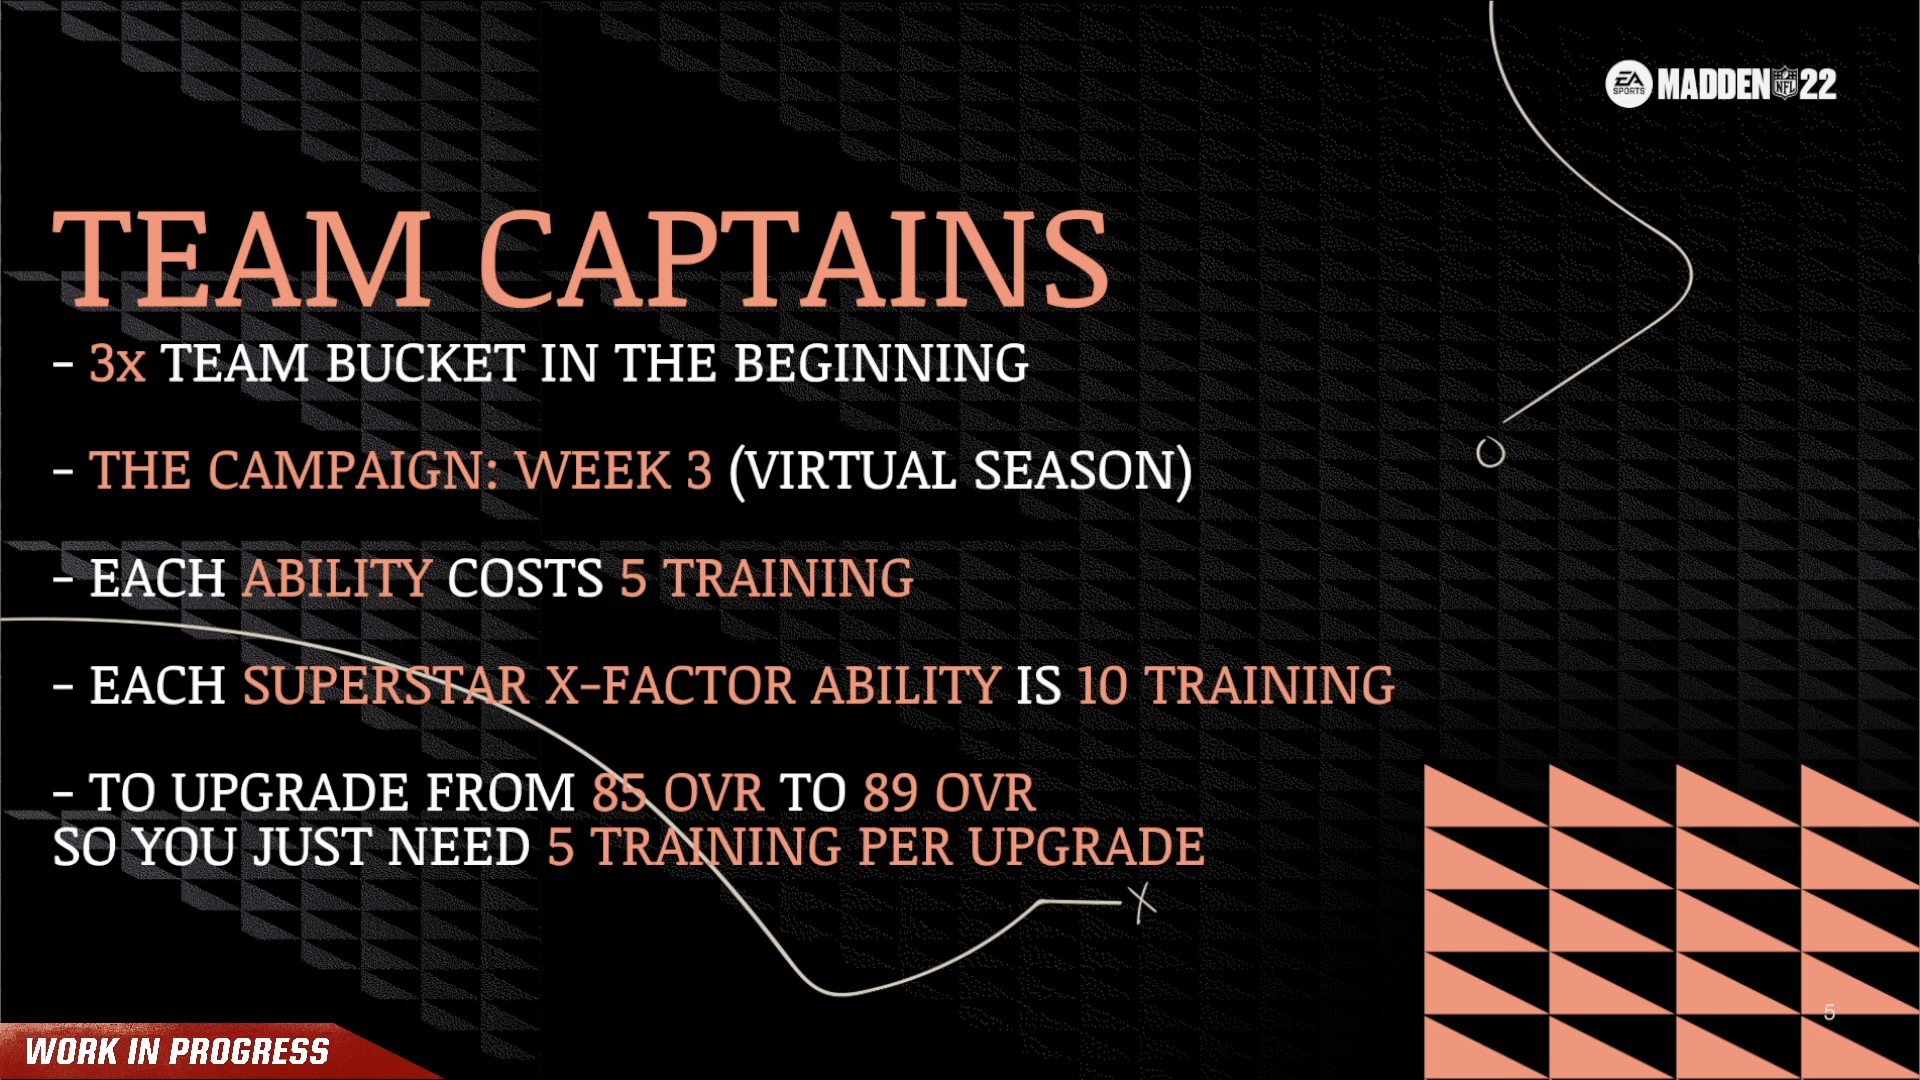 captain-title.jpg